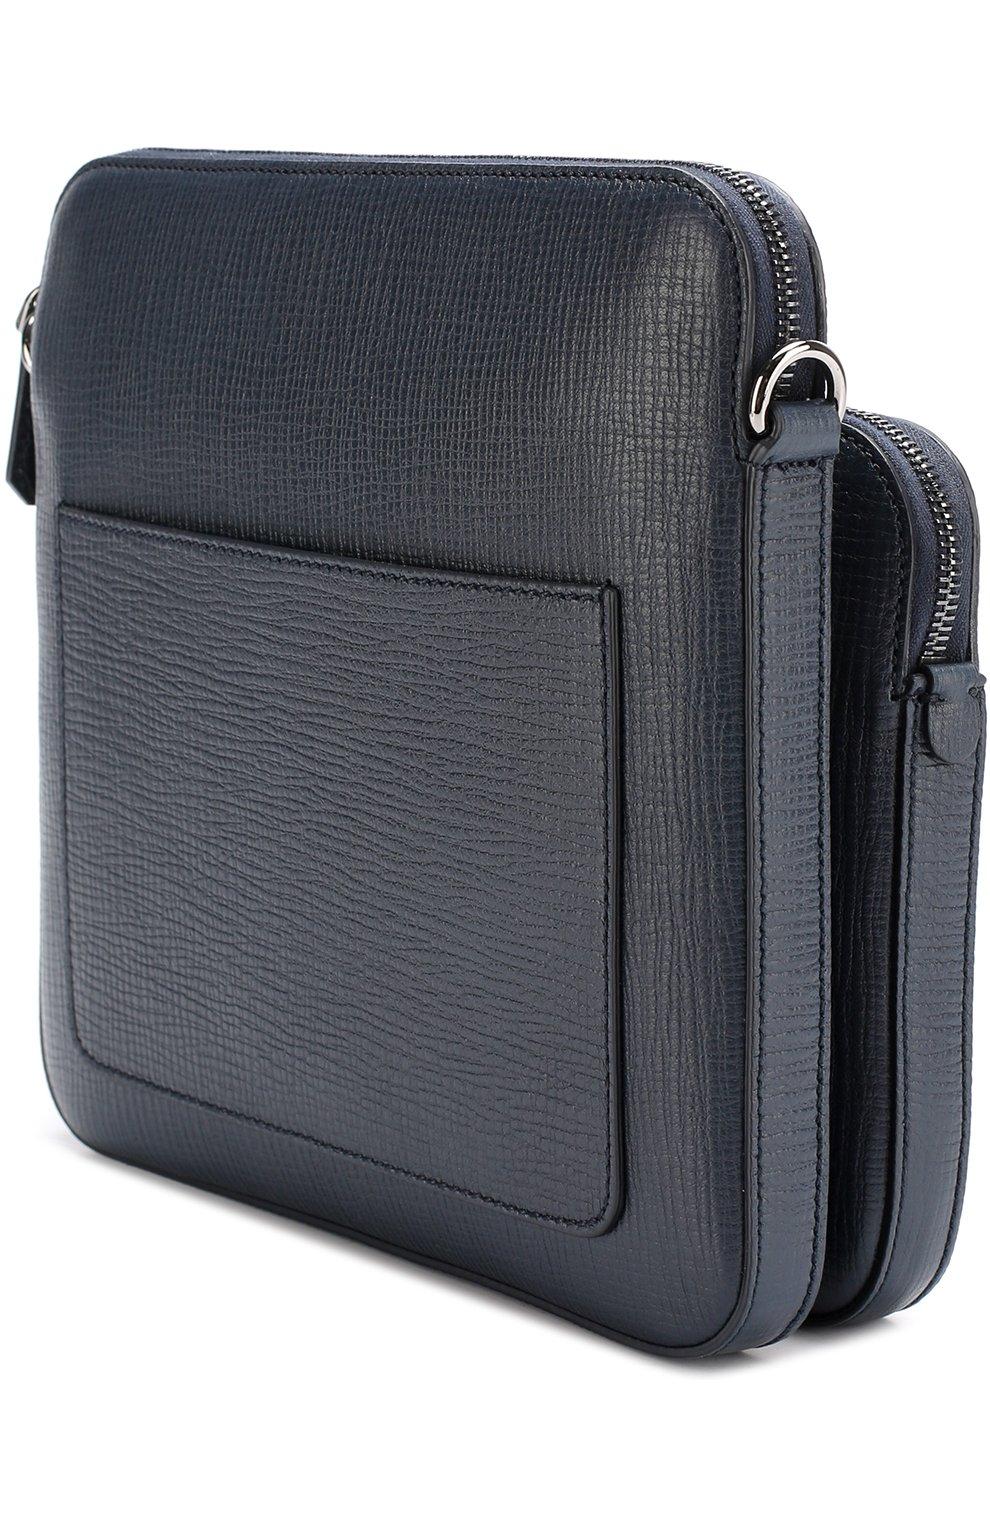 Кожаная сумка-планшет Mediterraneo с двумя отделениями на молнии Dolce & Gabbana темно-синяя | Фото №3